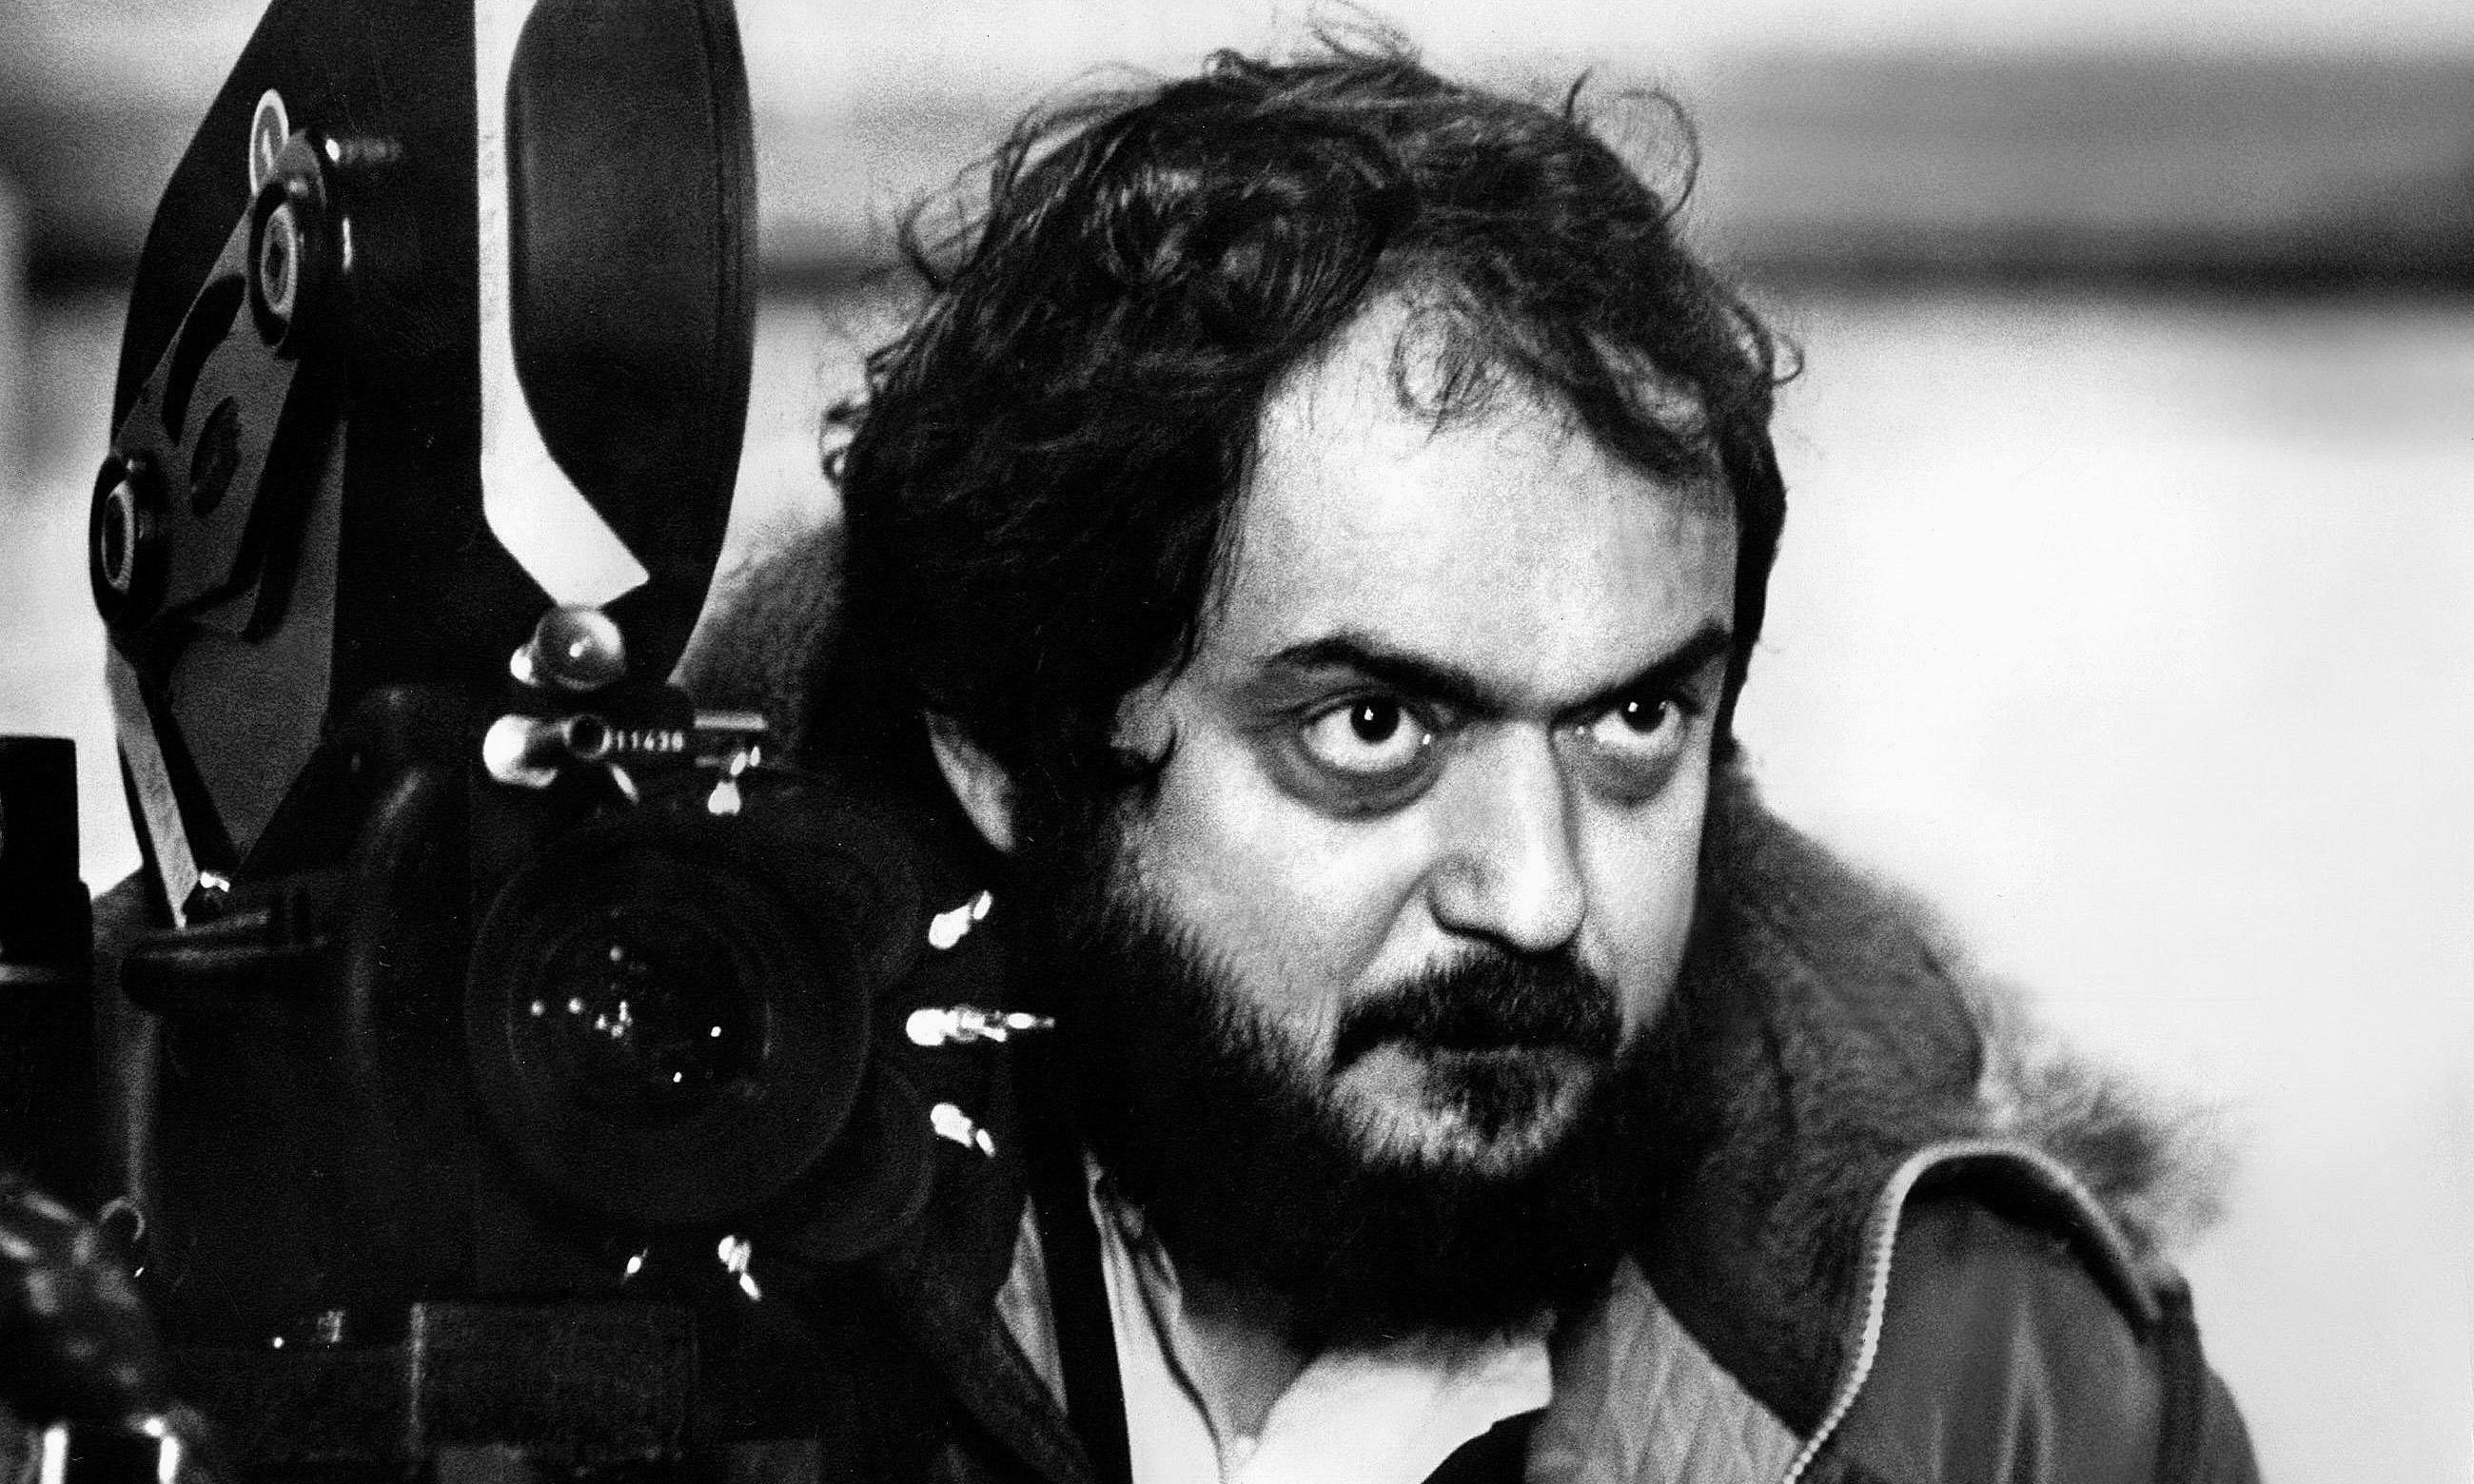 Newly found Stanley Kubrick script ideas focus on marital strife